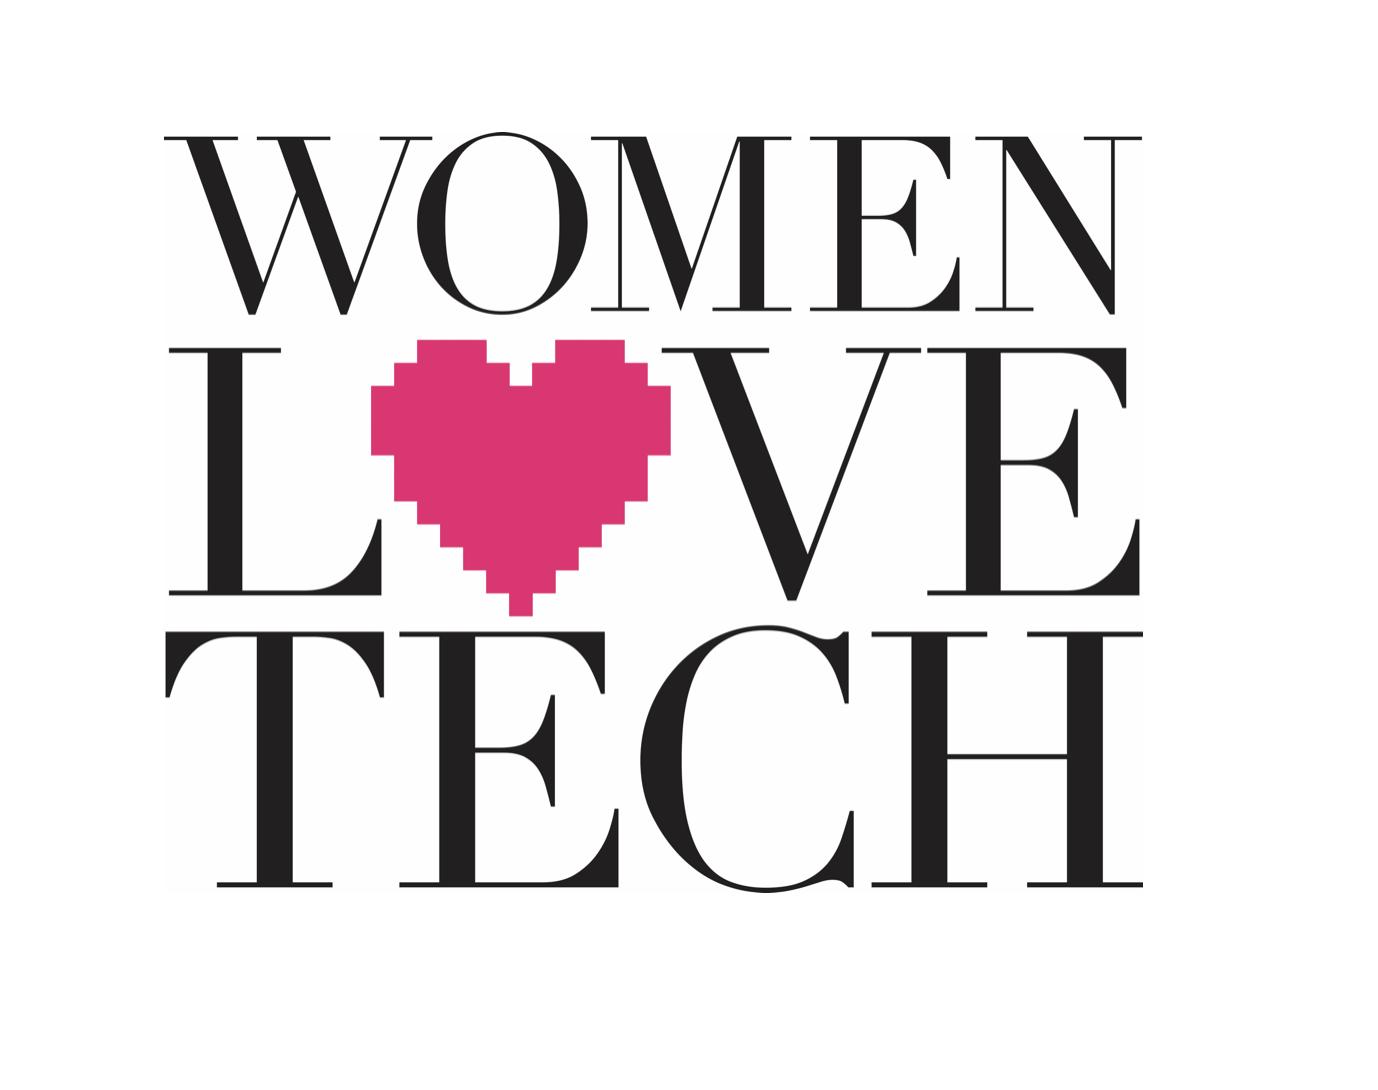 Women love Tech logo